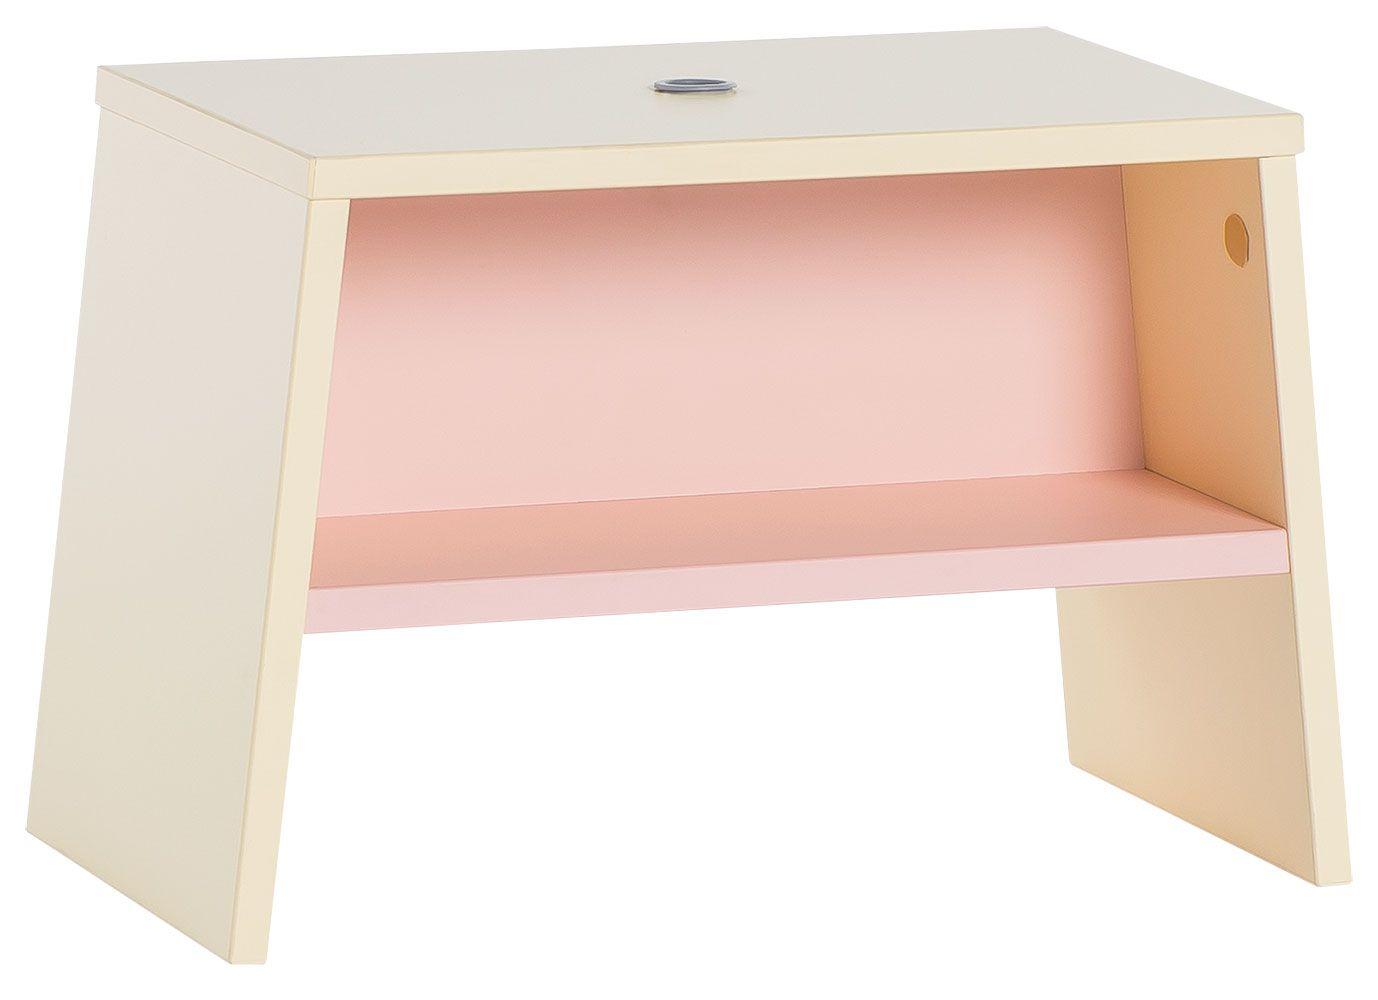 Kinderhocker Irlin 05, Farbe: Gelb / Rosa - Abmessungen: 31 x 46 x 25 cm (H x B x T)